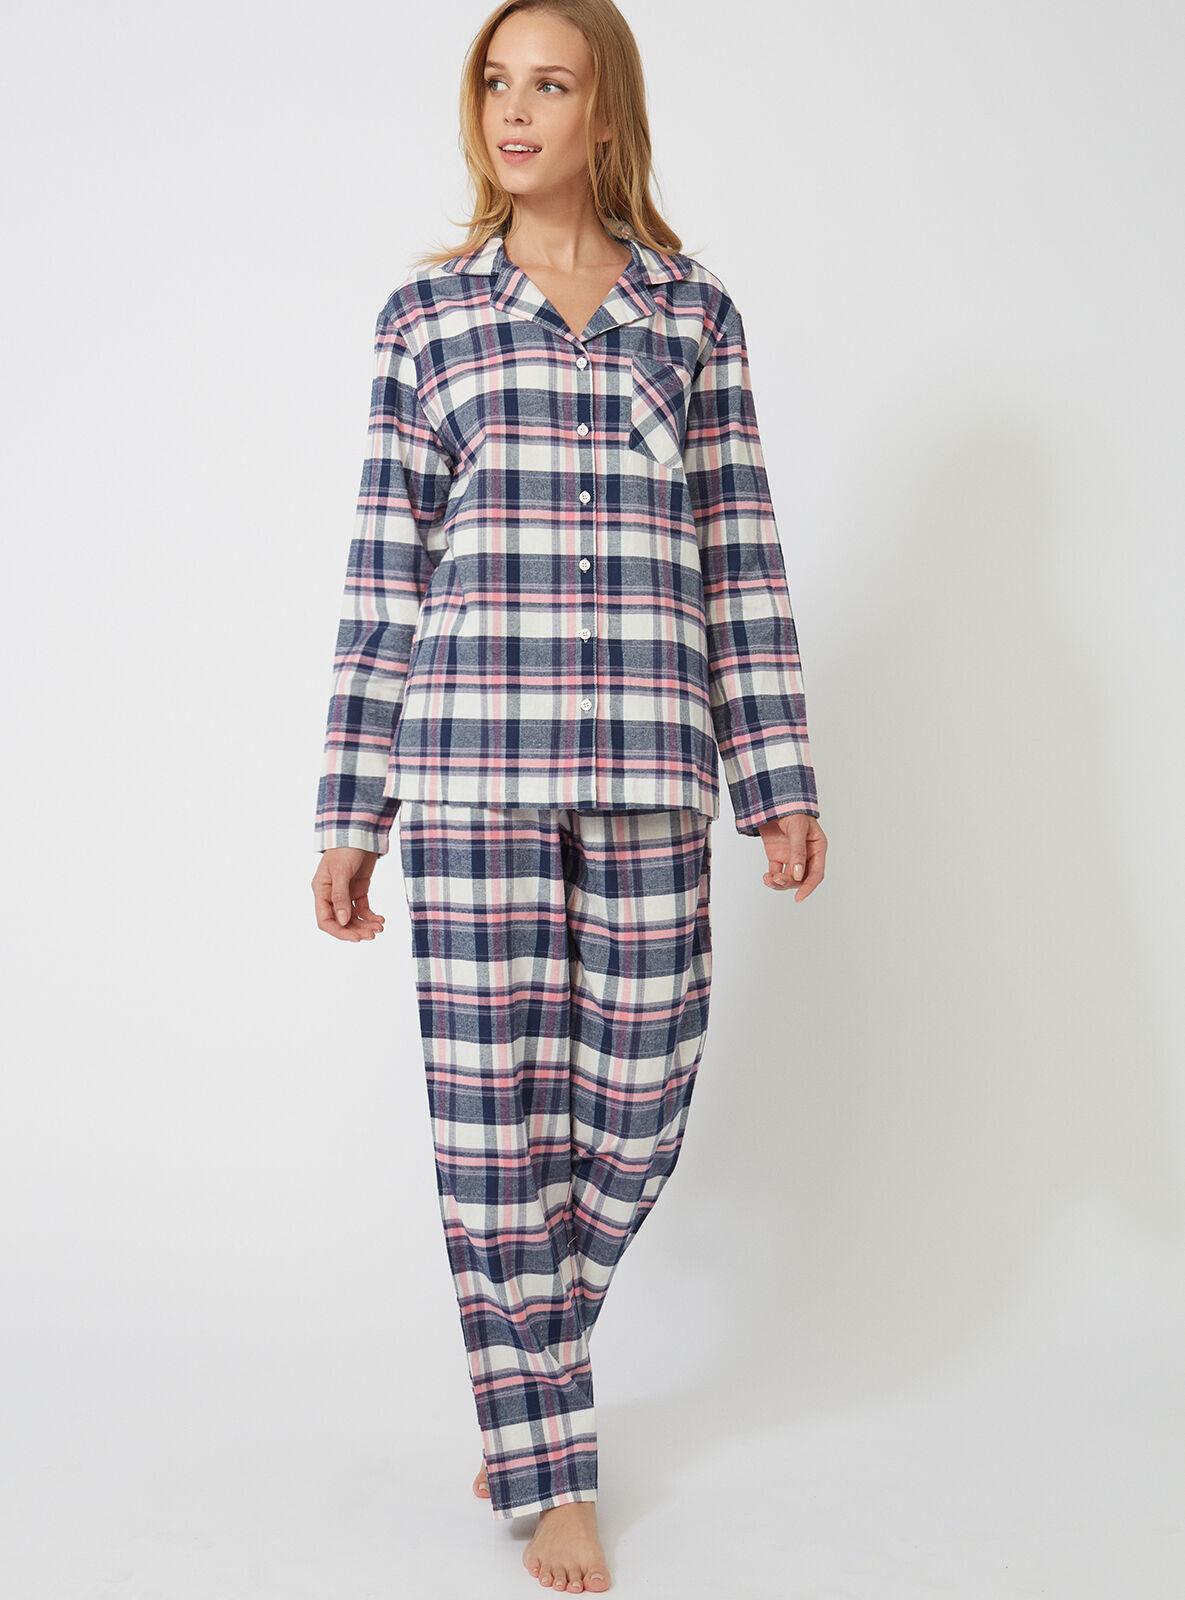 8306bd961e Ladies Satin Pyjama Set 3 Piece Set Lace Vest Shorts Bottoms Pants Womens  PJ s Nightwear